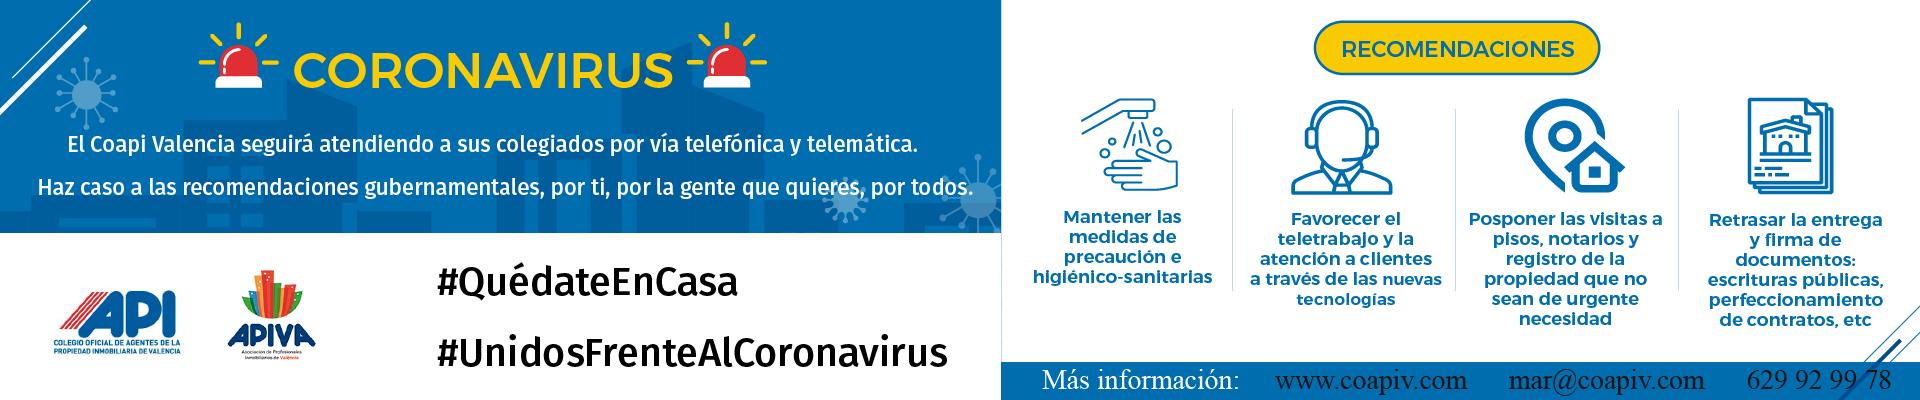 coronavirus_coapi-valencia-banner-web